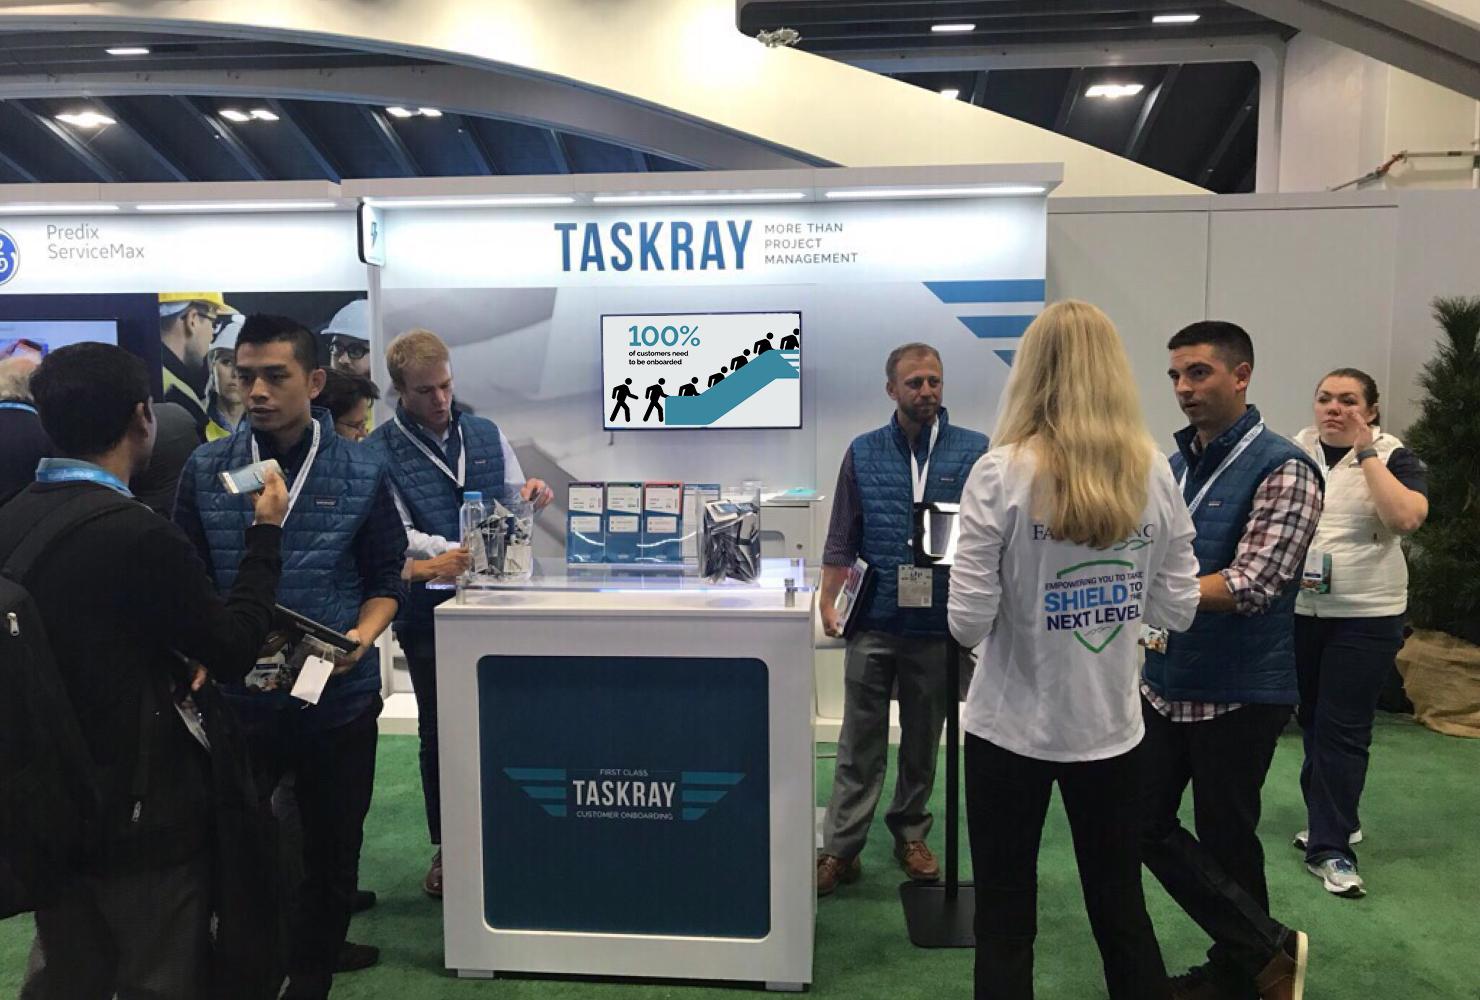 TaskRay-Dreamforce-2018-booth.png